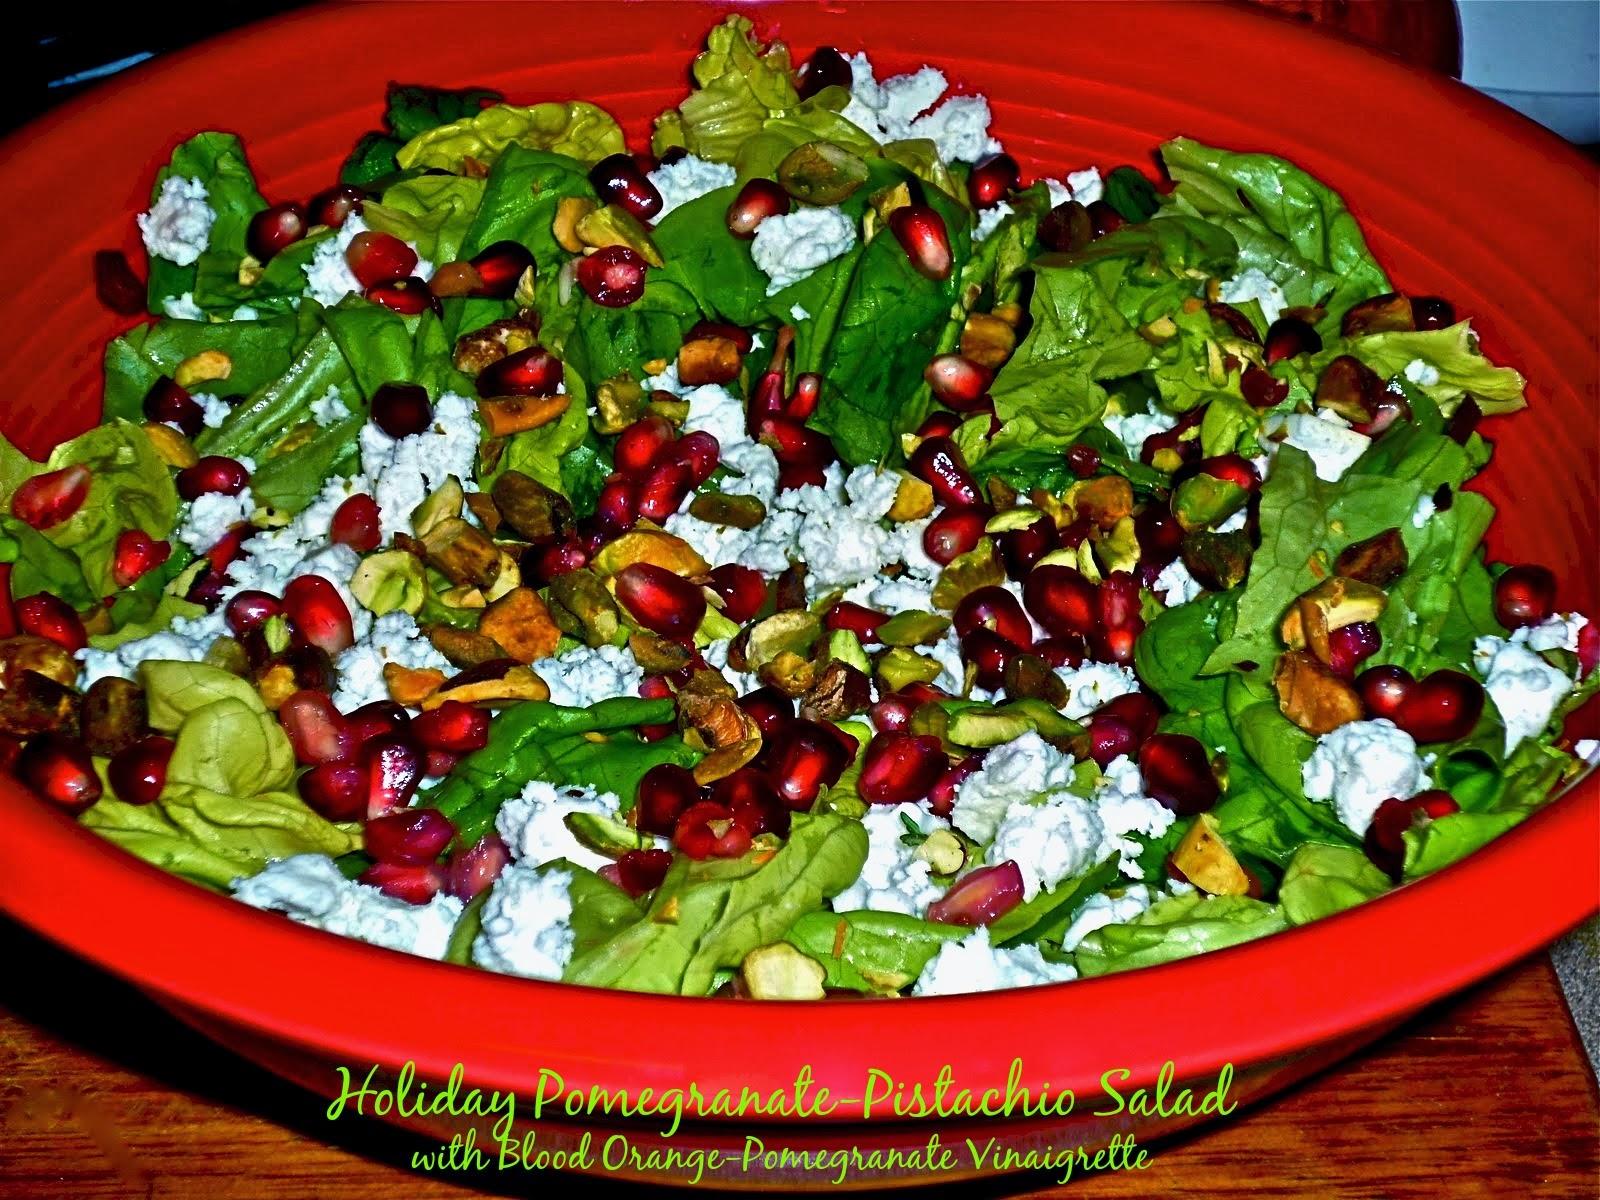 The Weekend Gourmet  Pomegranate  TheSaladBar...Featuring Holiday ... 62ebdf9098a0